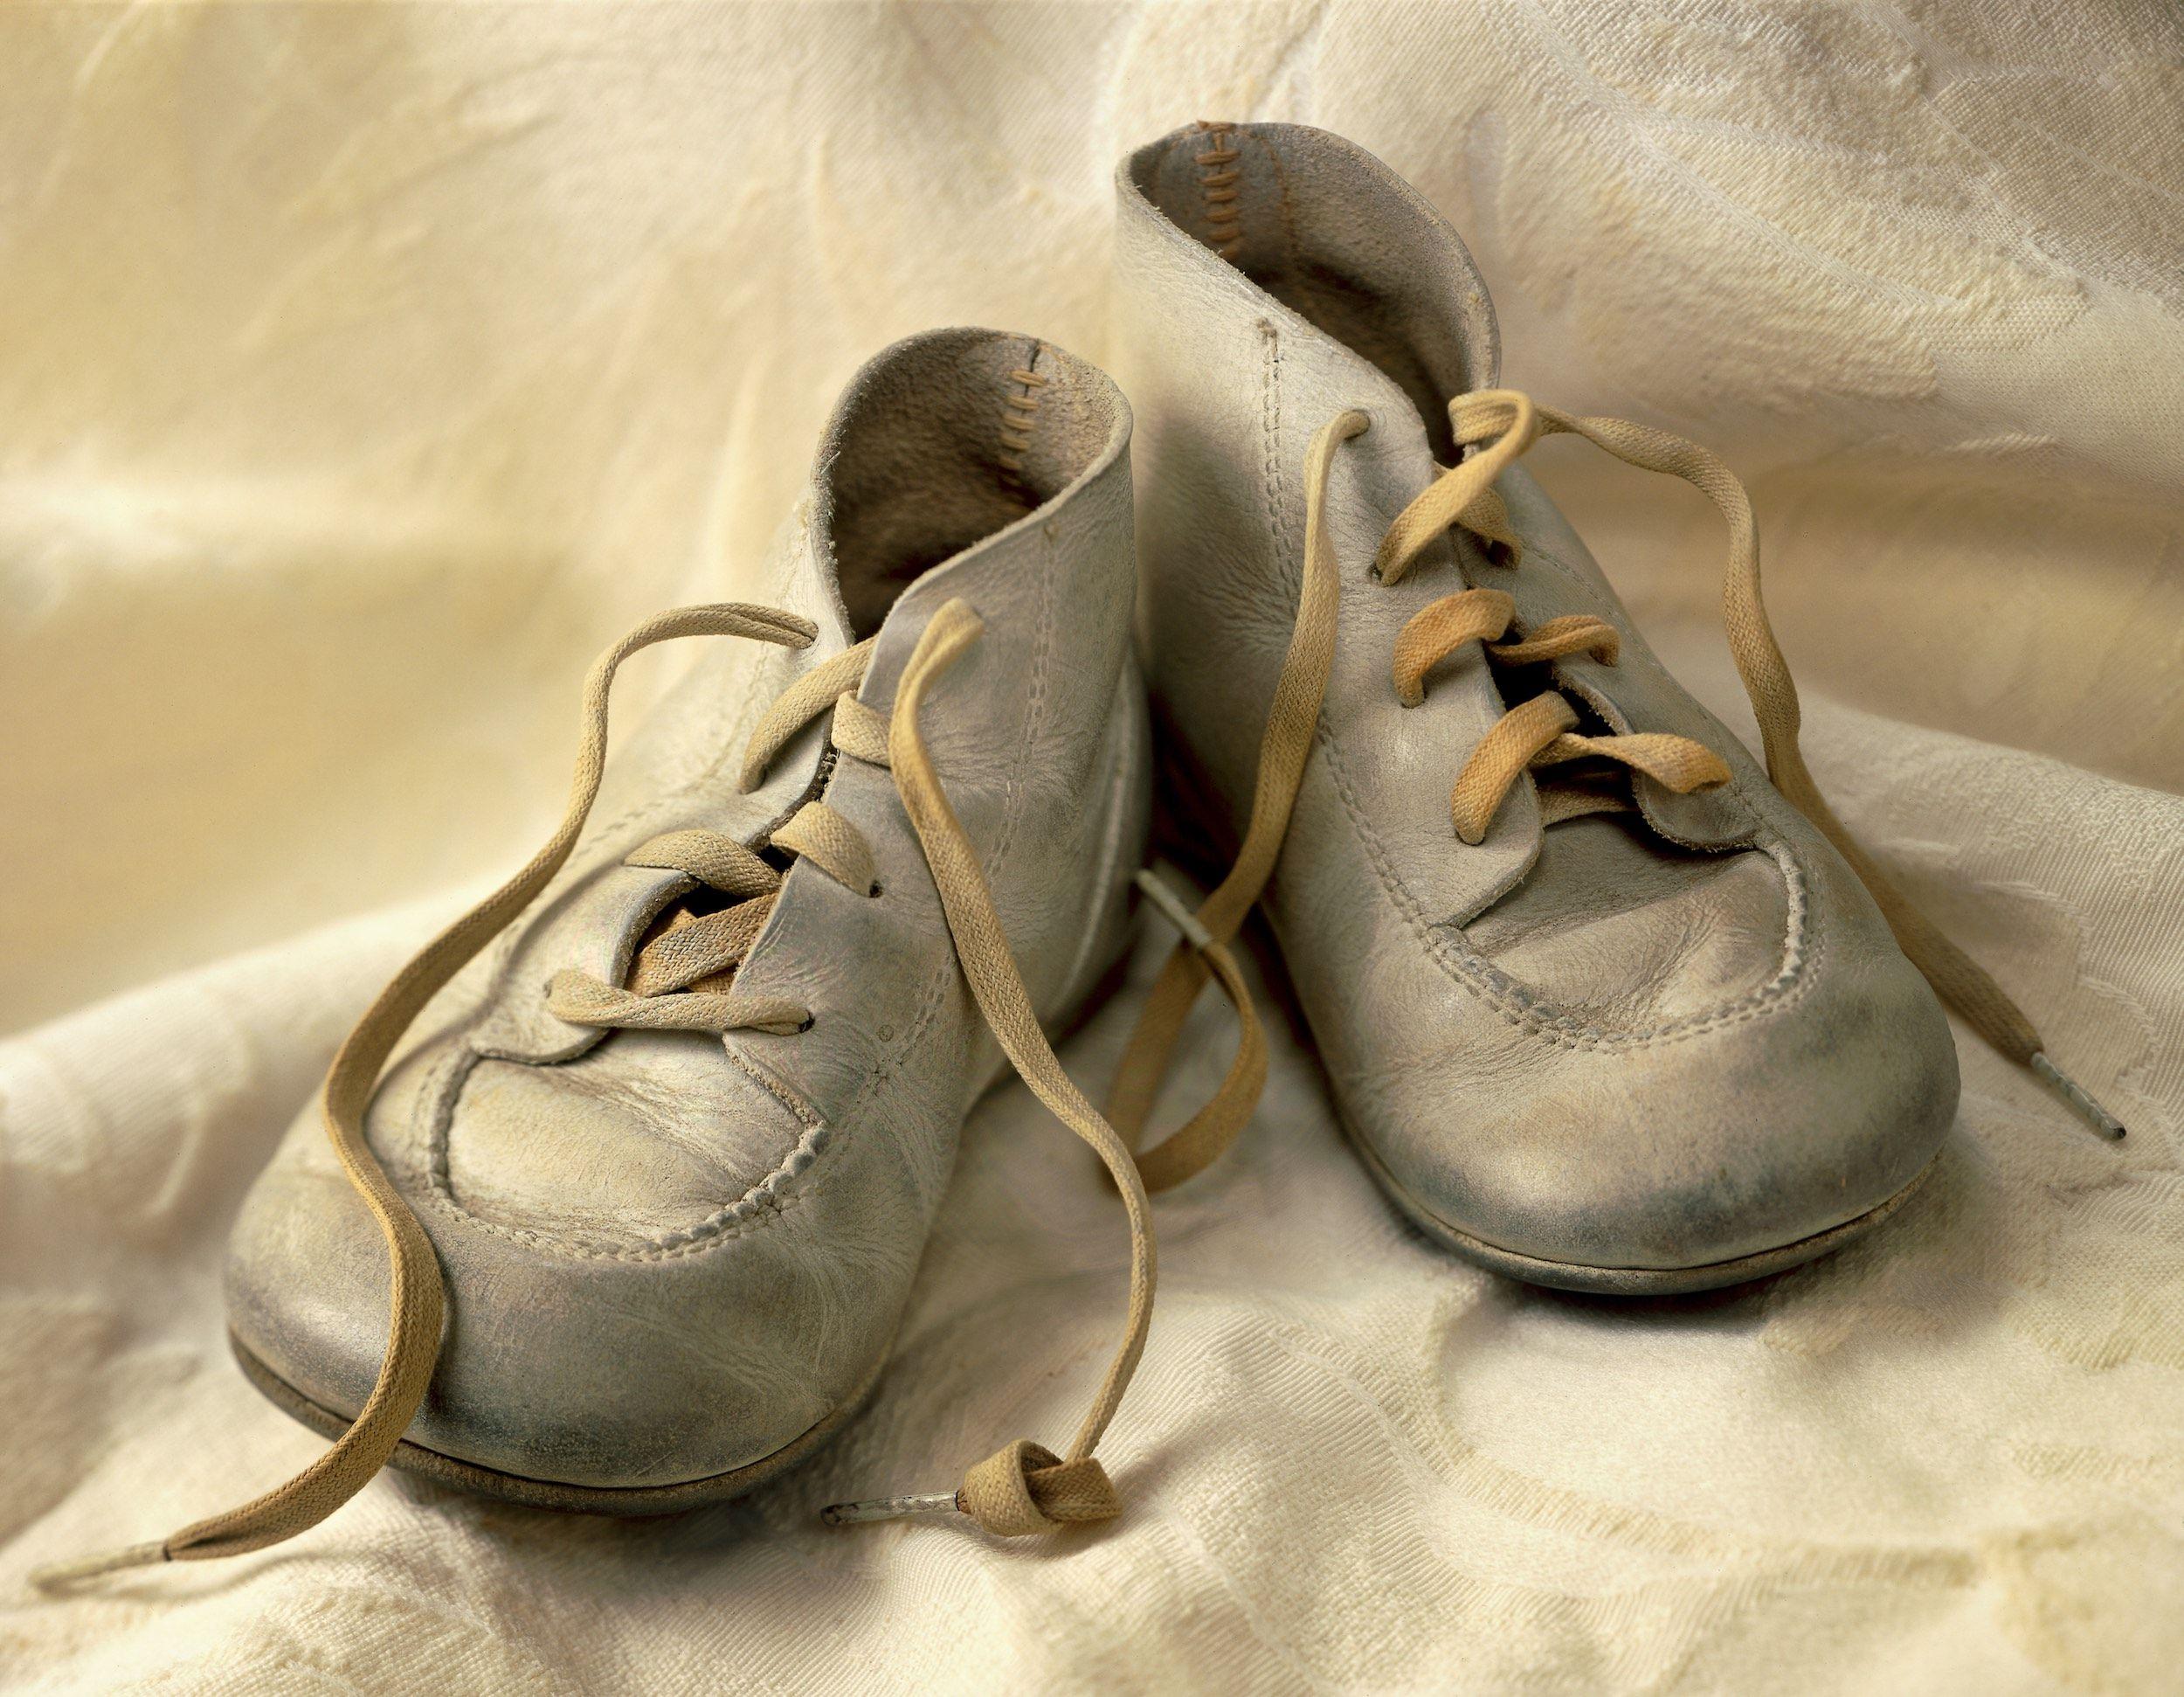 Baby Shoes LBN.jpg